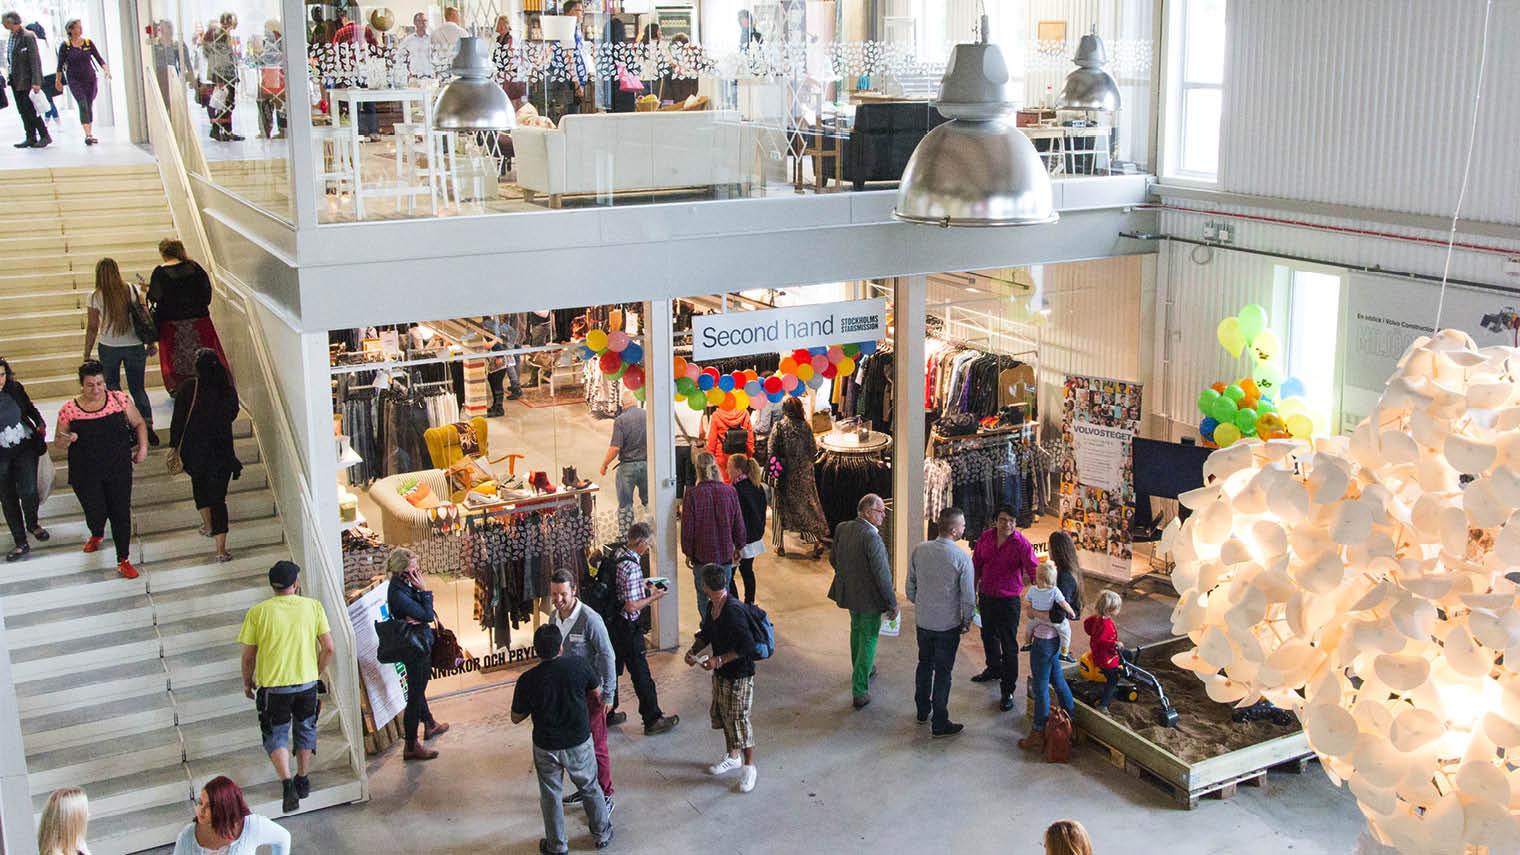 ReTuna Återbruksgalleria, the world's first recycling mall